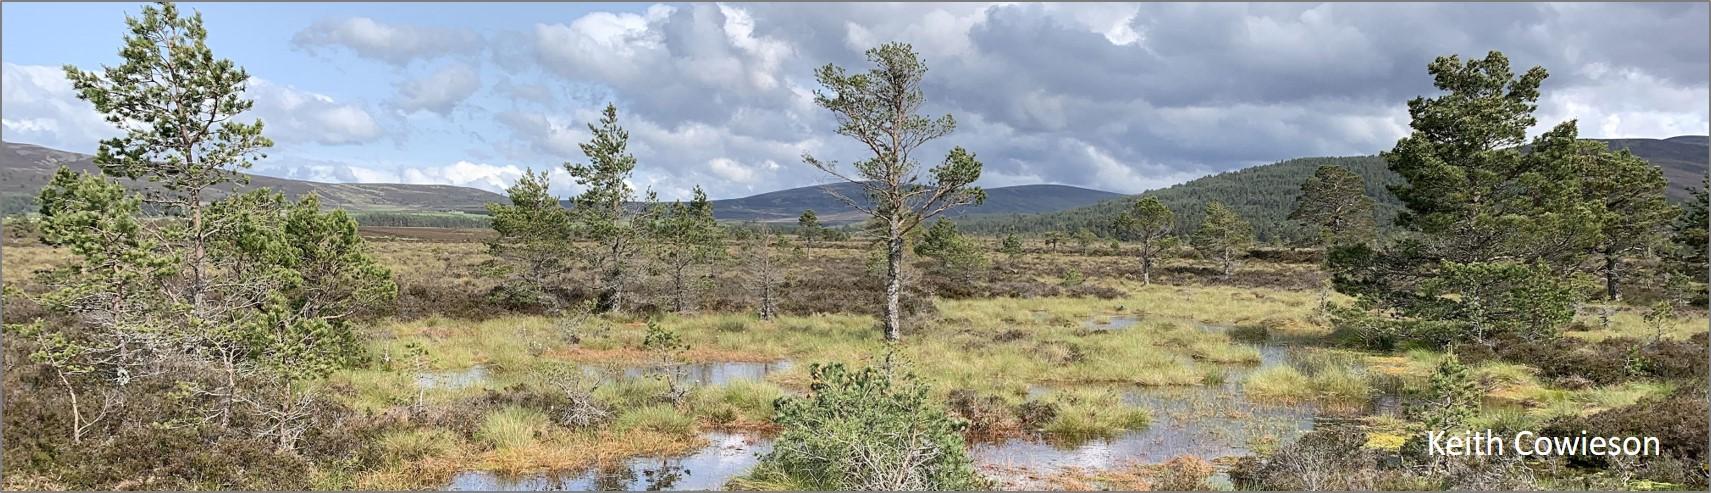 blog wood sp habitat